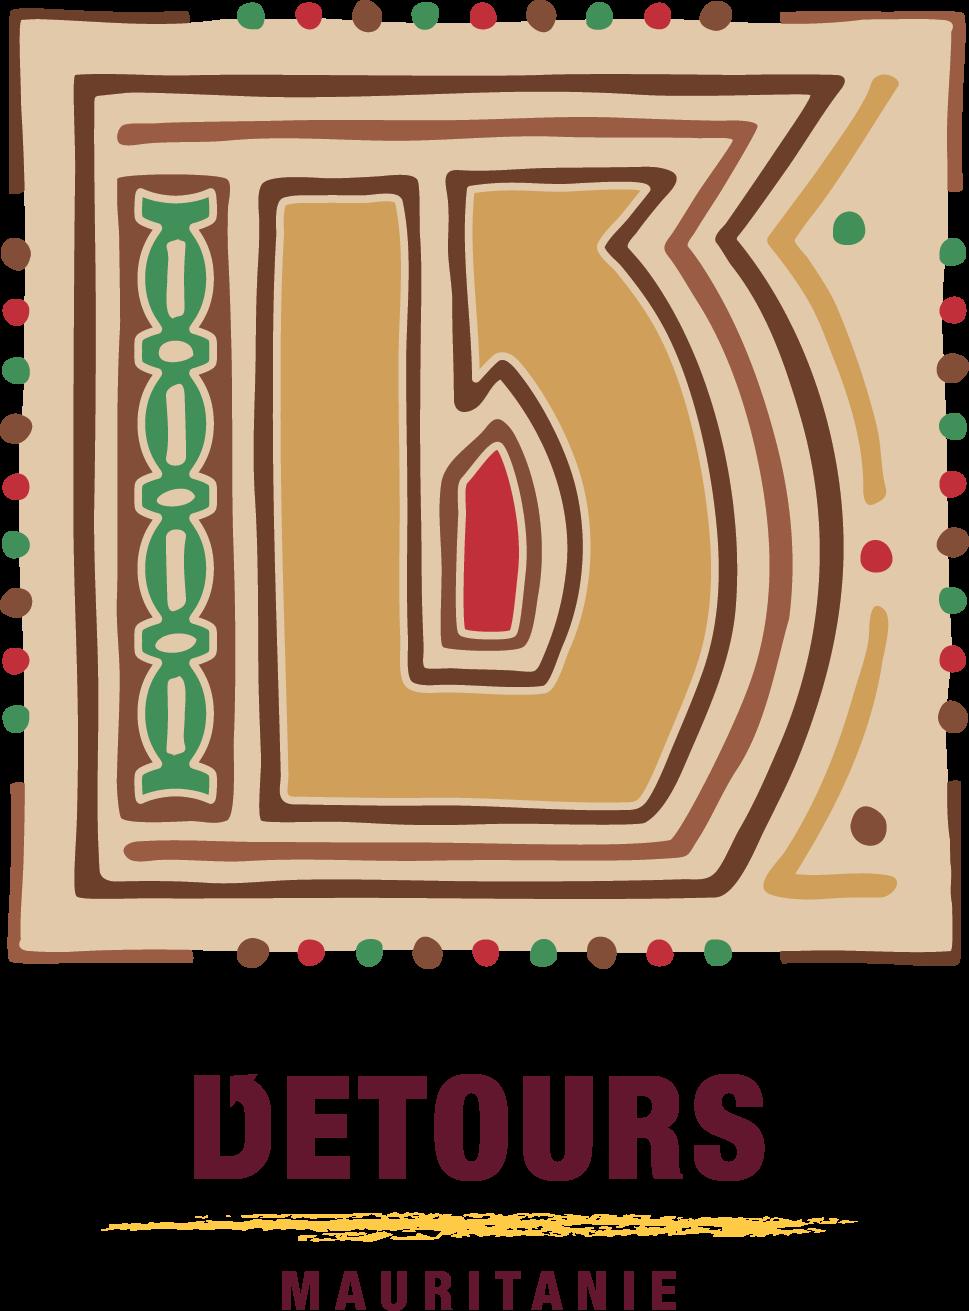 ©detours-mauritanie-logo1